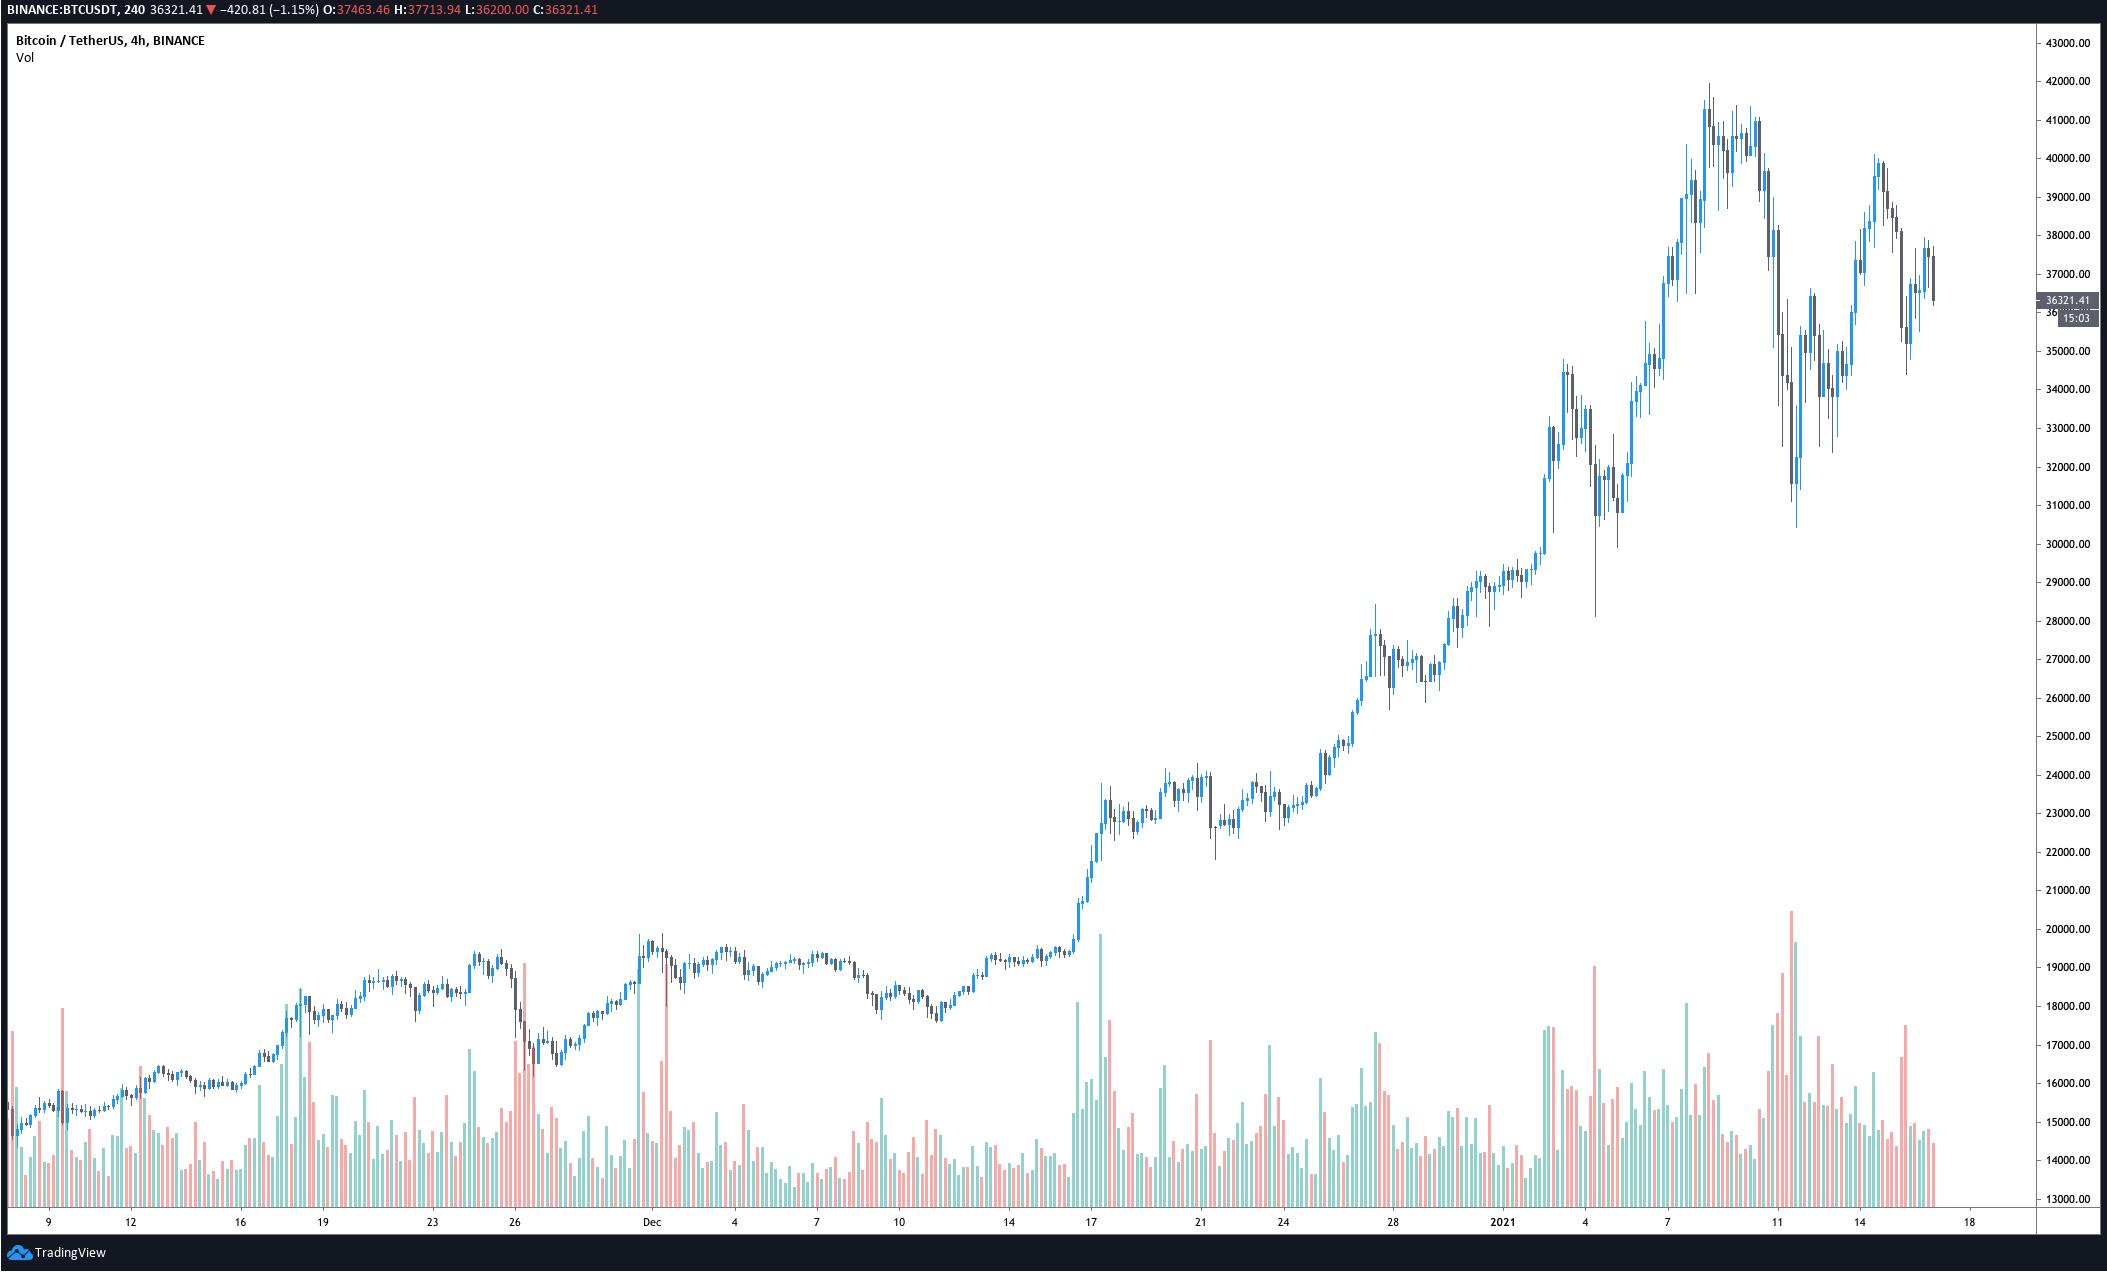 Traders say Bitcoin price 'needed pullback' to maintain bullish momentum